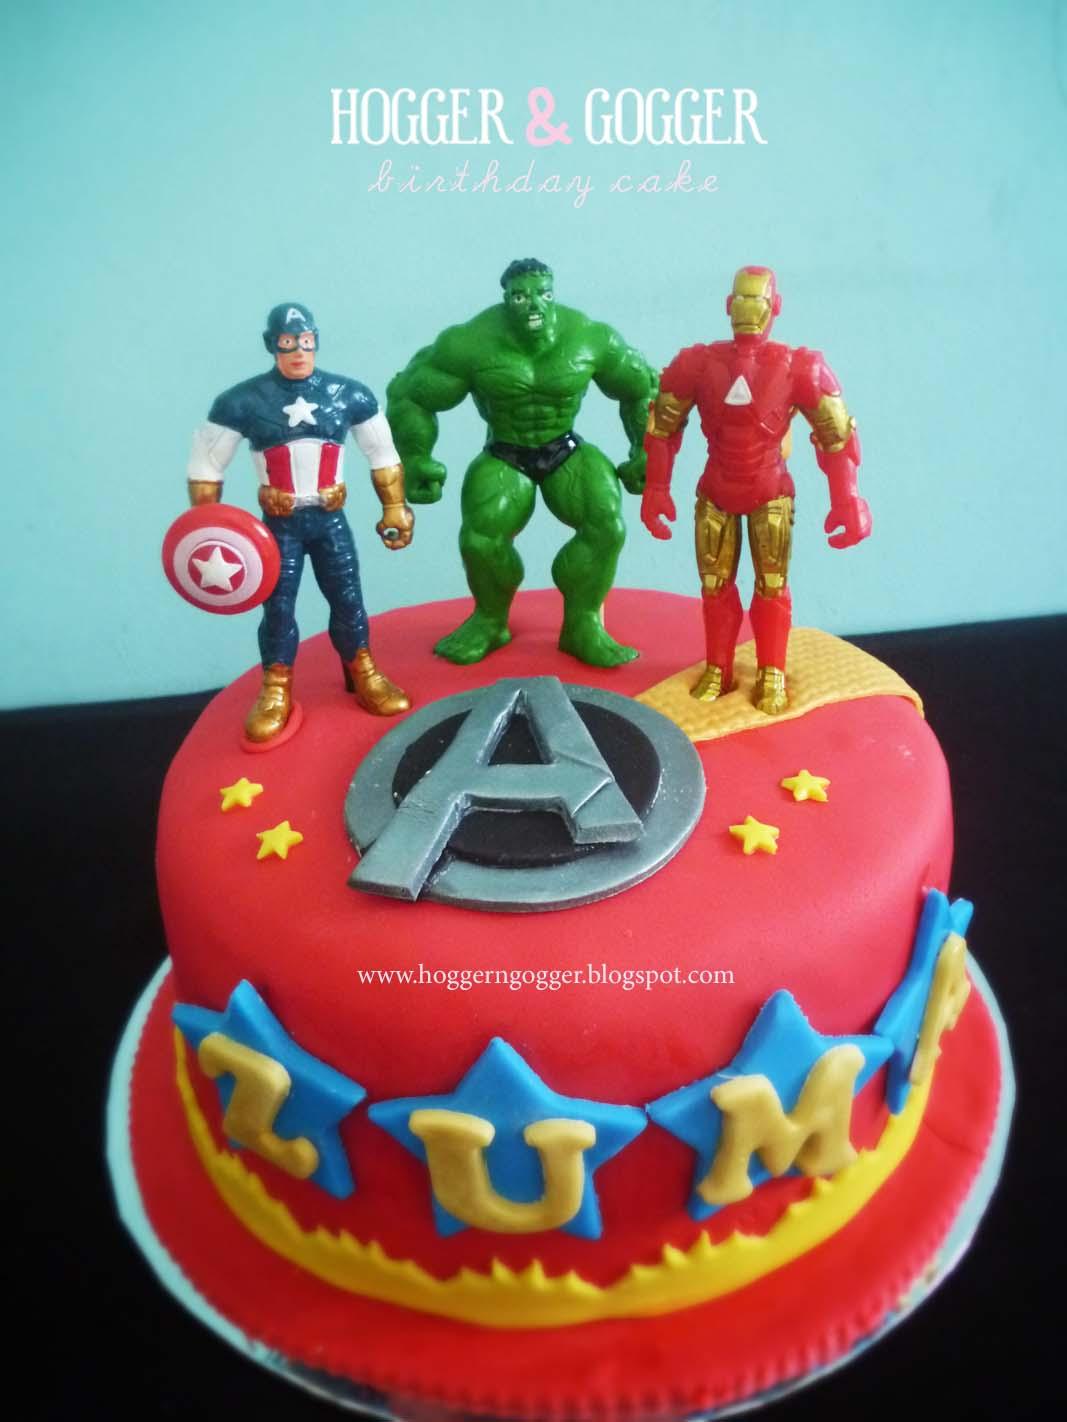 HoggerGogger Hot Wheels and Avengers Theme Birthday cake